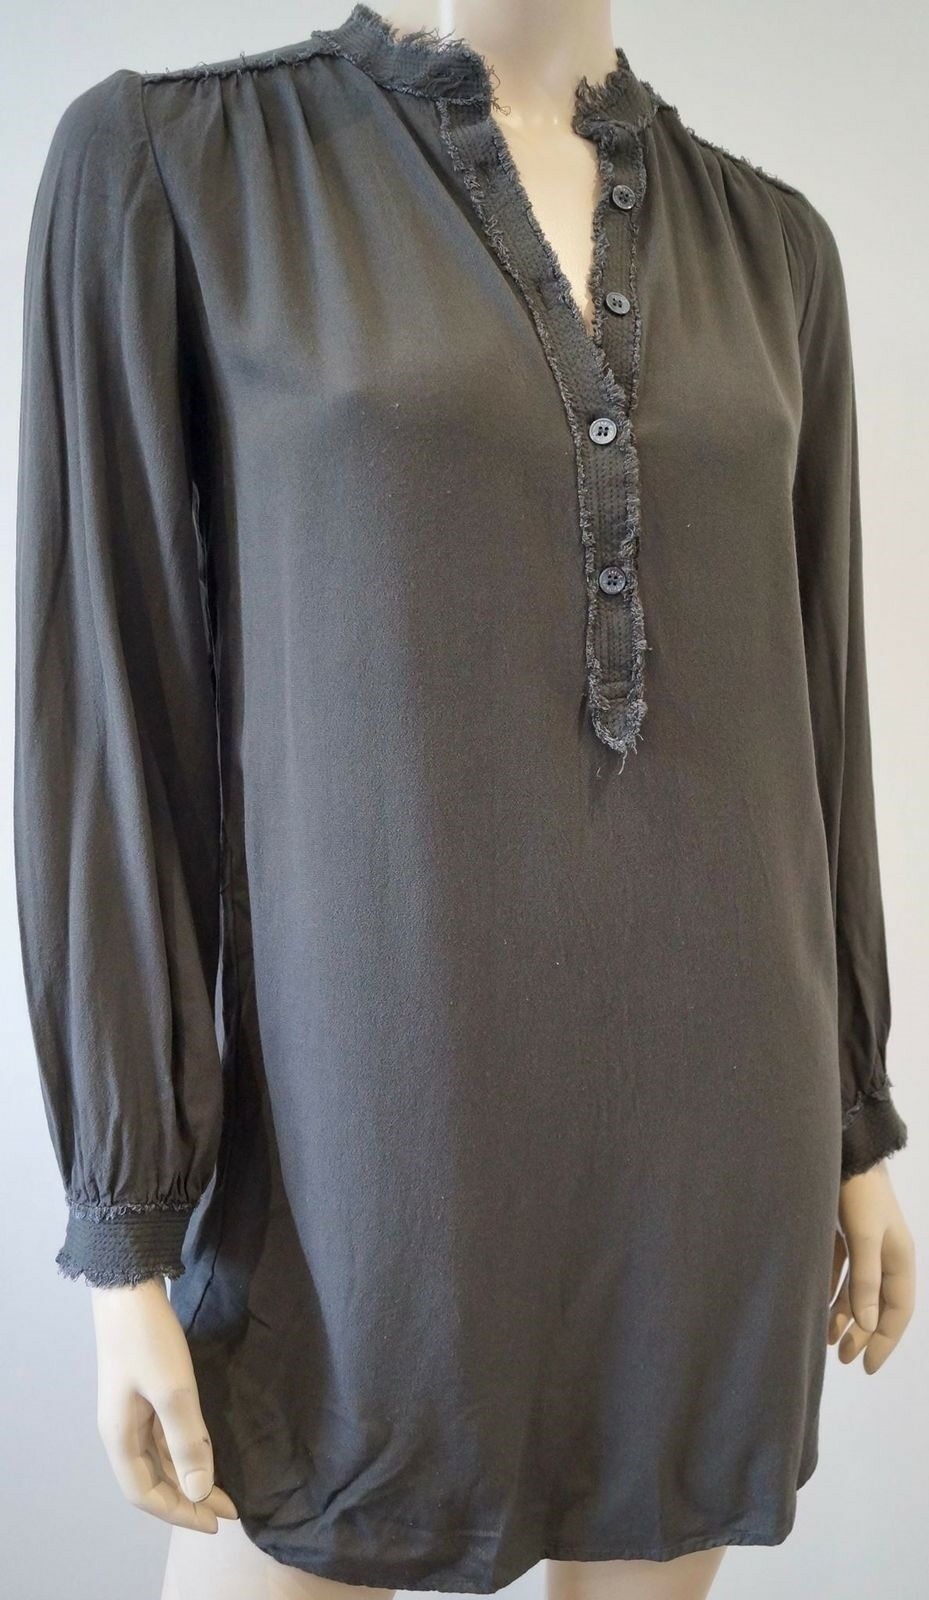 ZADIG & VOLTAIRE Woherren grau Collarless Long Sleeve Casual Blouse Shirt Top XS